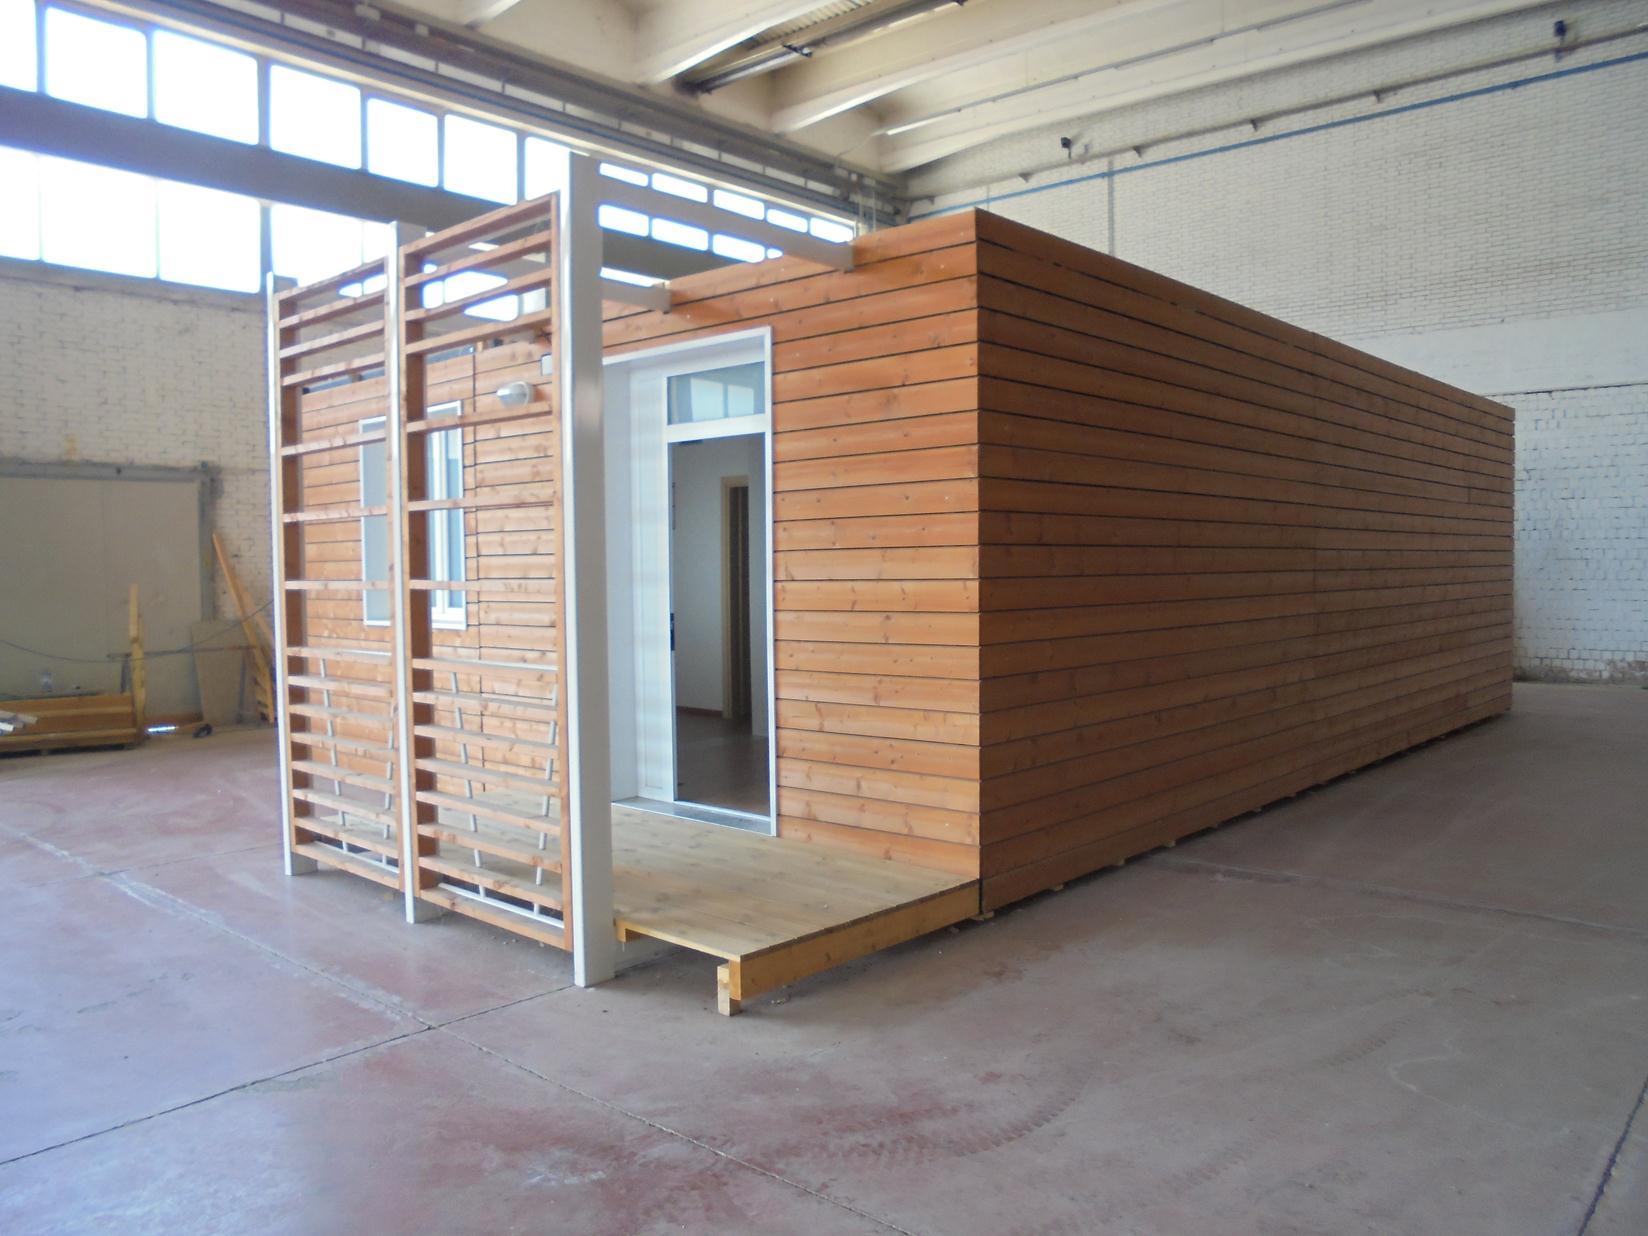 Casa prefabbricata in legno shelbox 9 80x6 70 4springs for Casa mobile in legno